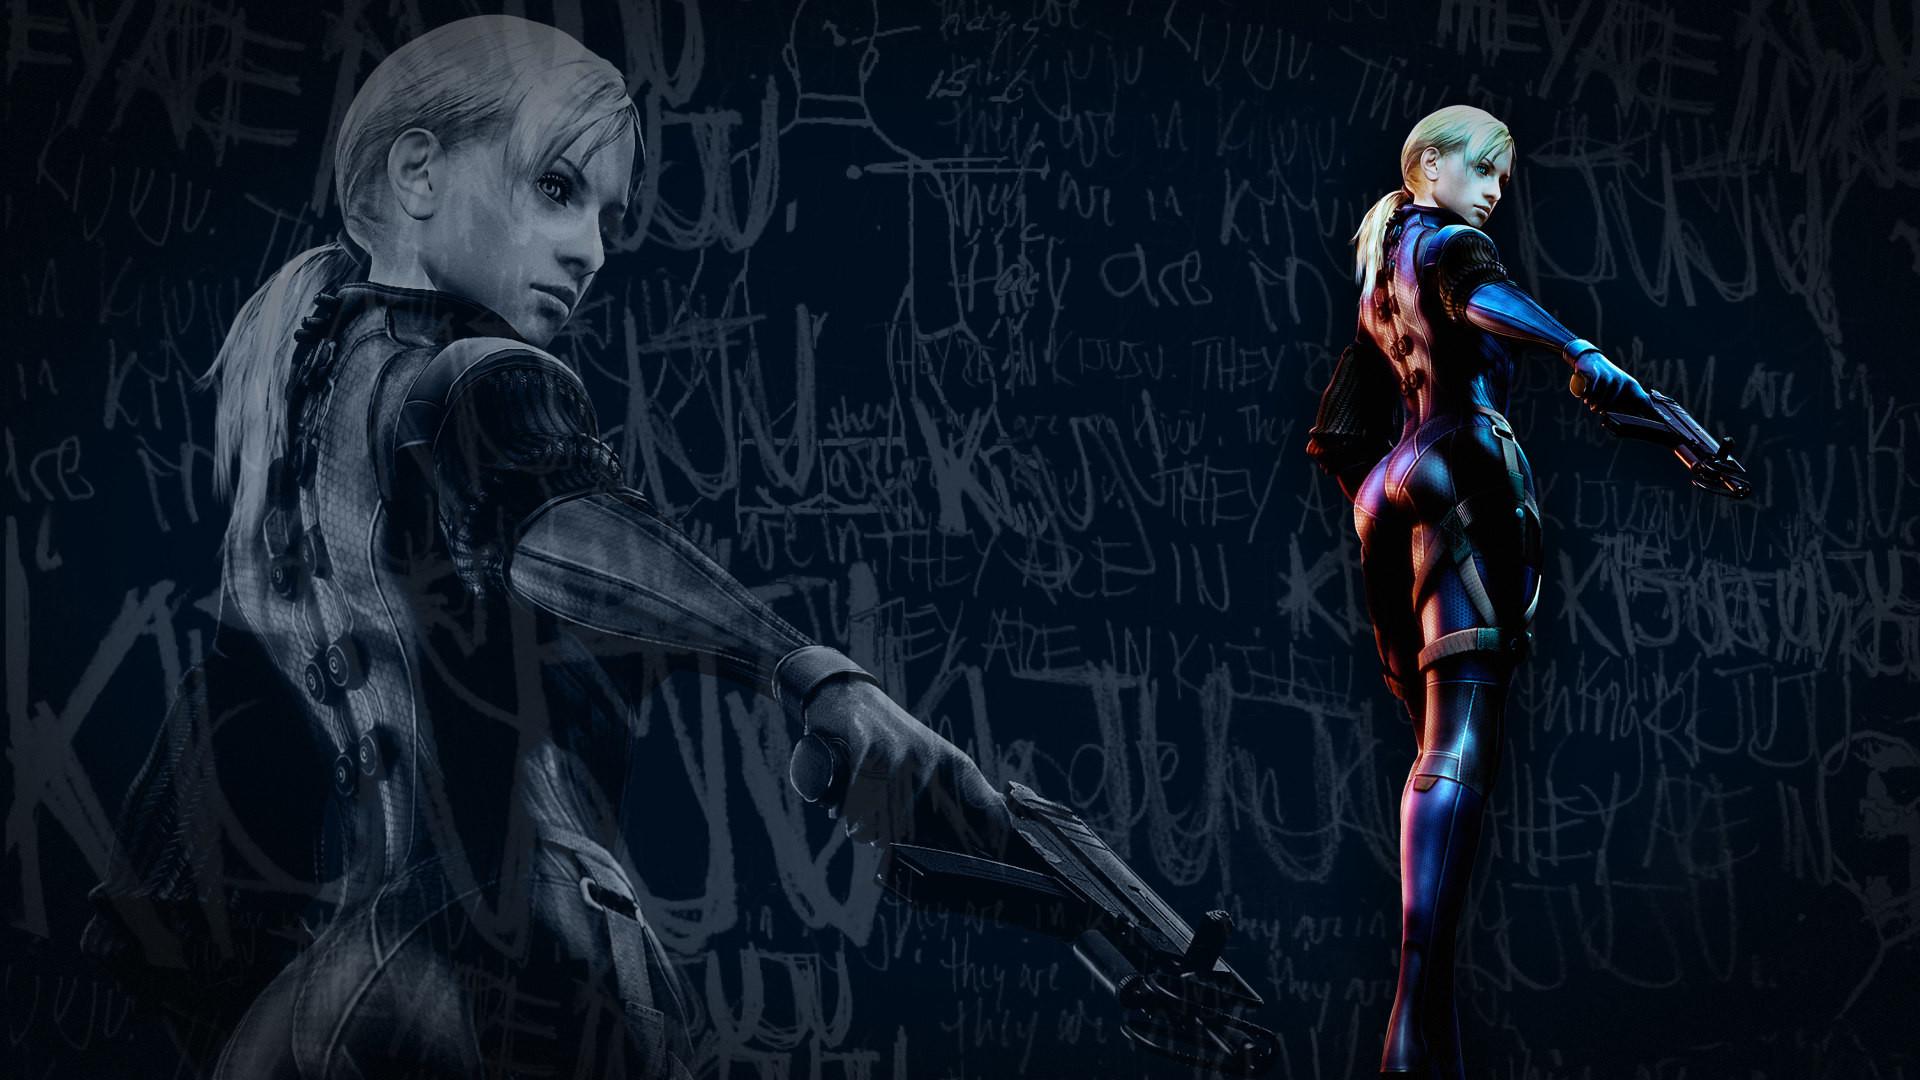 Resident Evil 5 / Biohazard 5 – Jill Valentine (RE5) | Steam Trading Cards  Wiki | FANDOM powered by Wikia